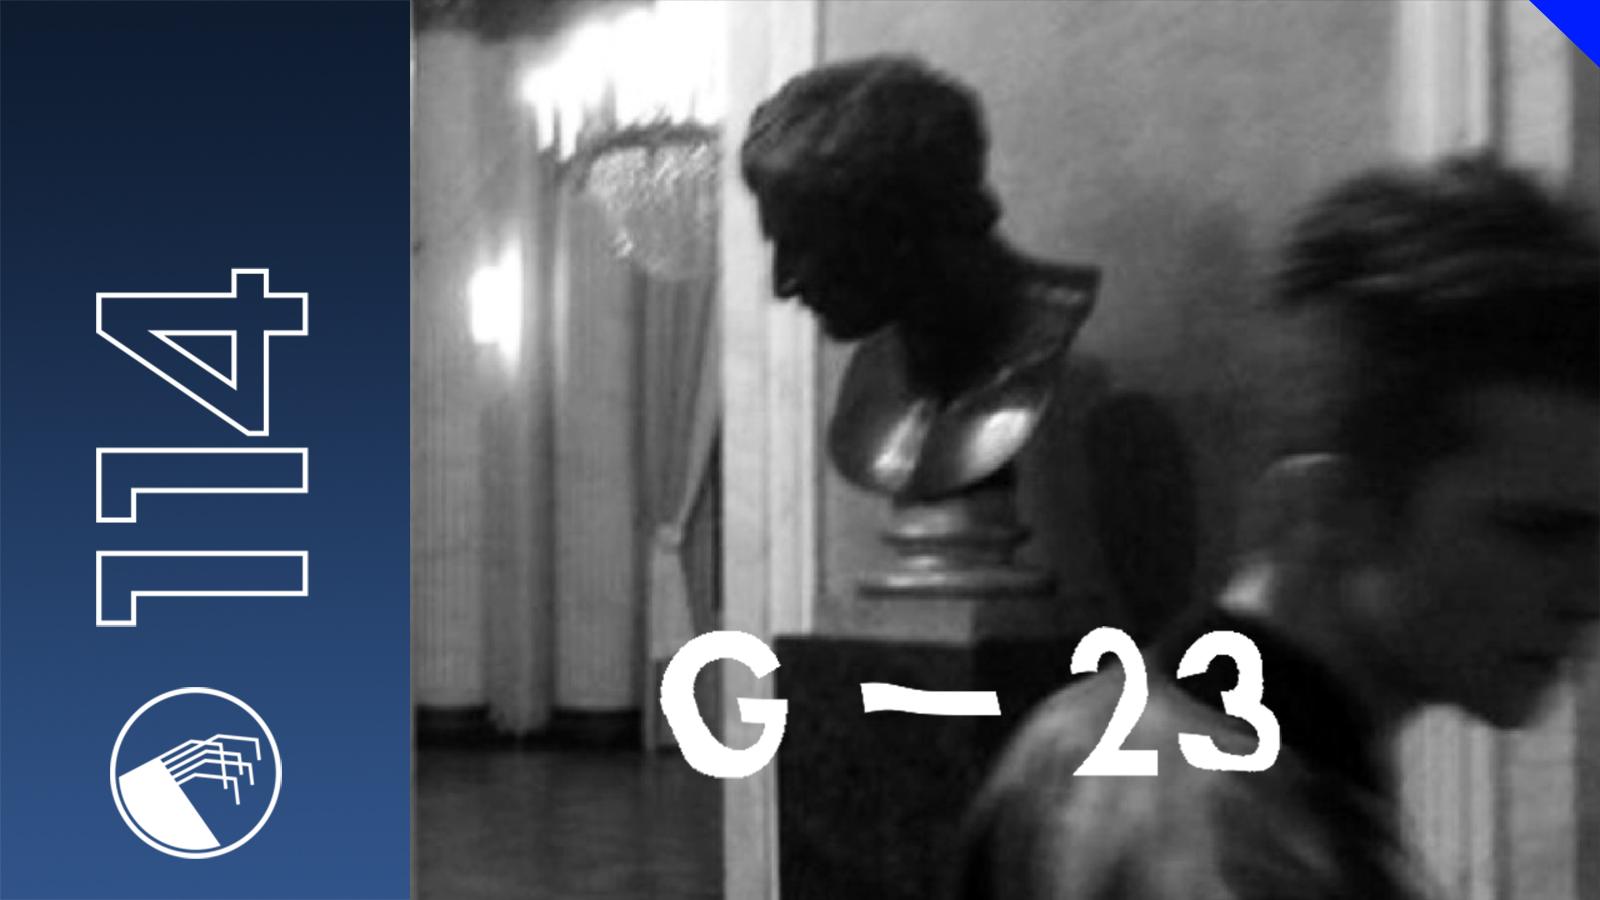 114 G-23